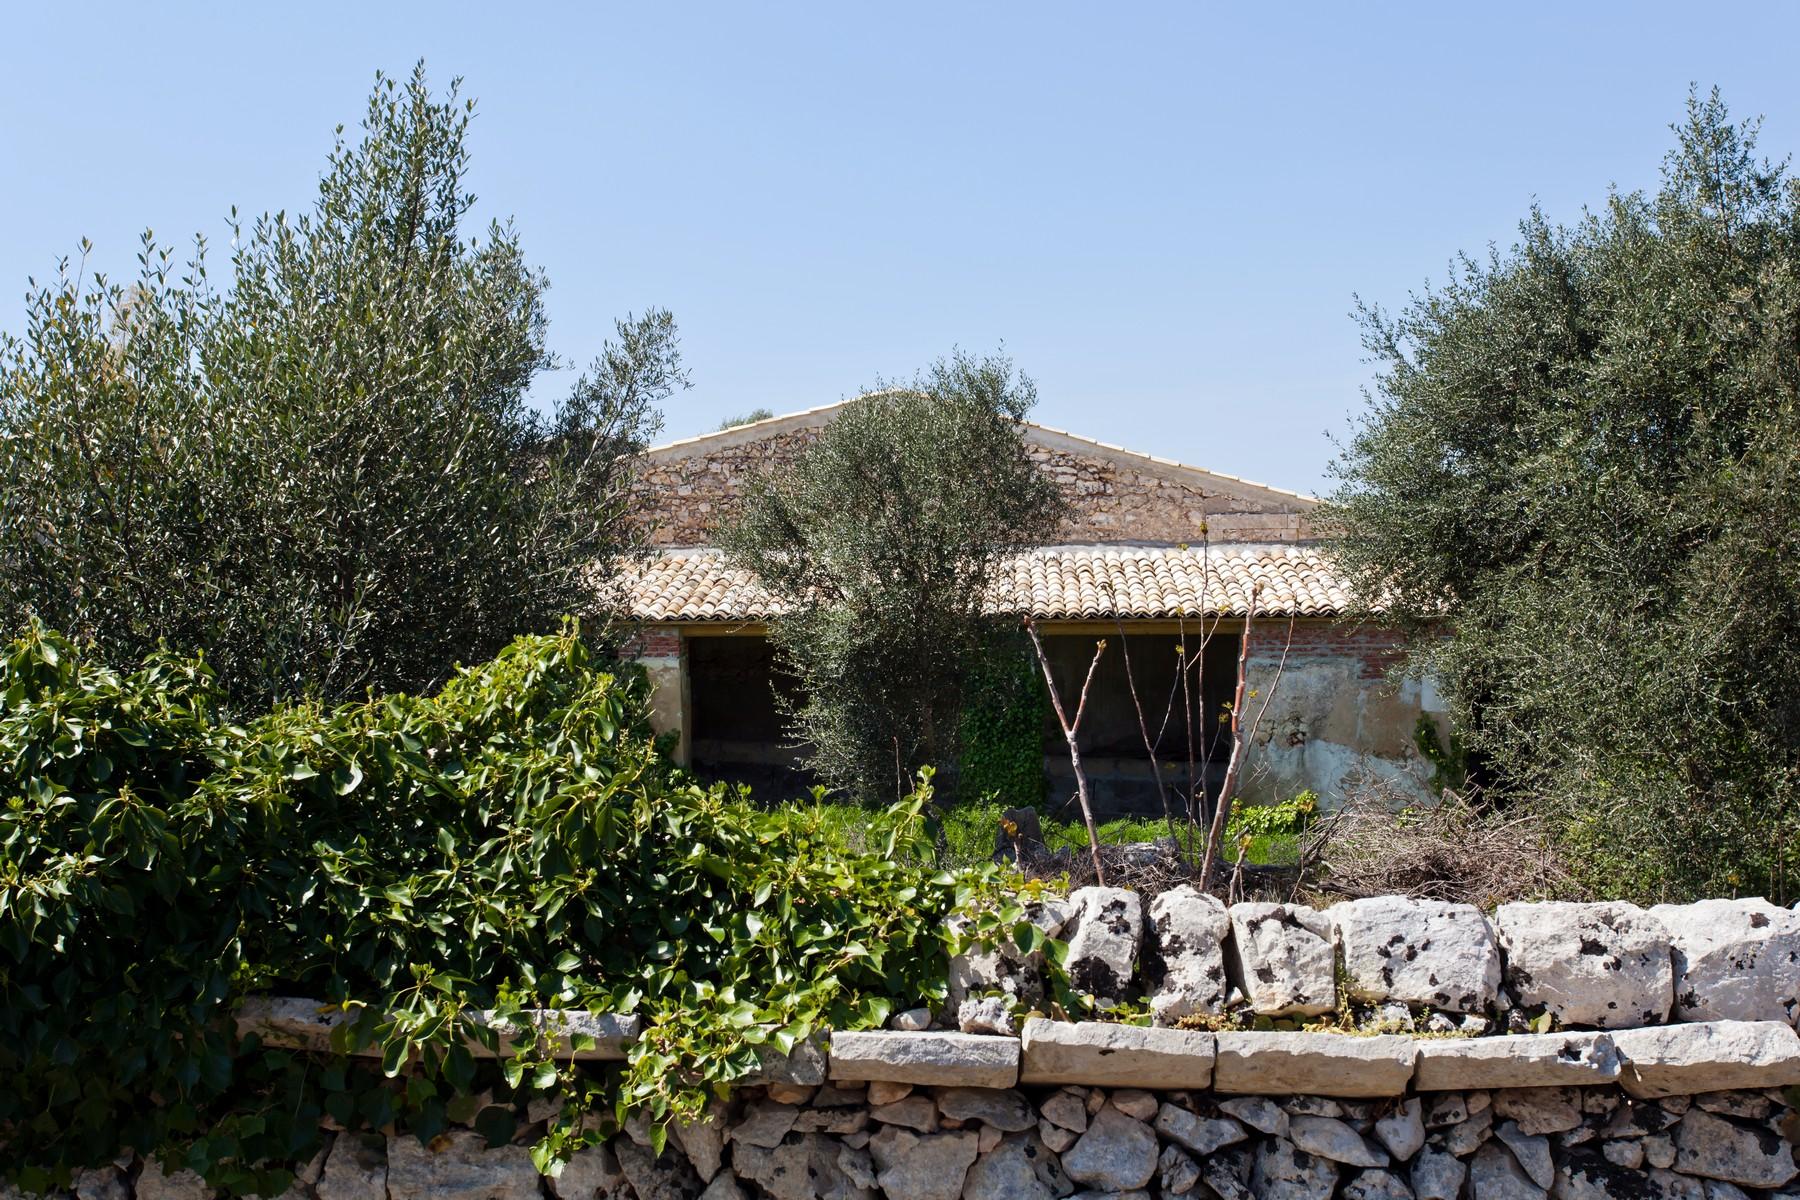 Casa indipendente in Vendita a Noto: 5 locali, 1000 mq - Foto 19